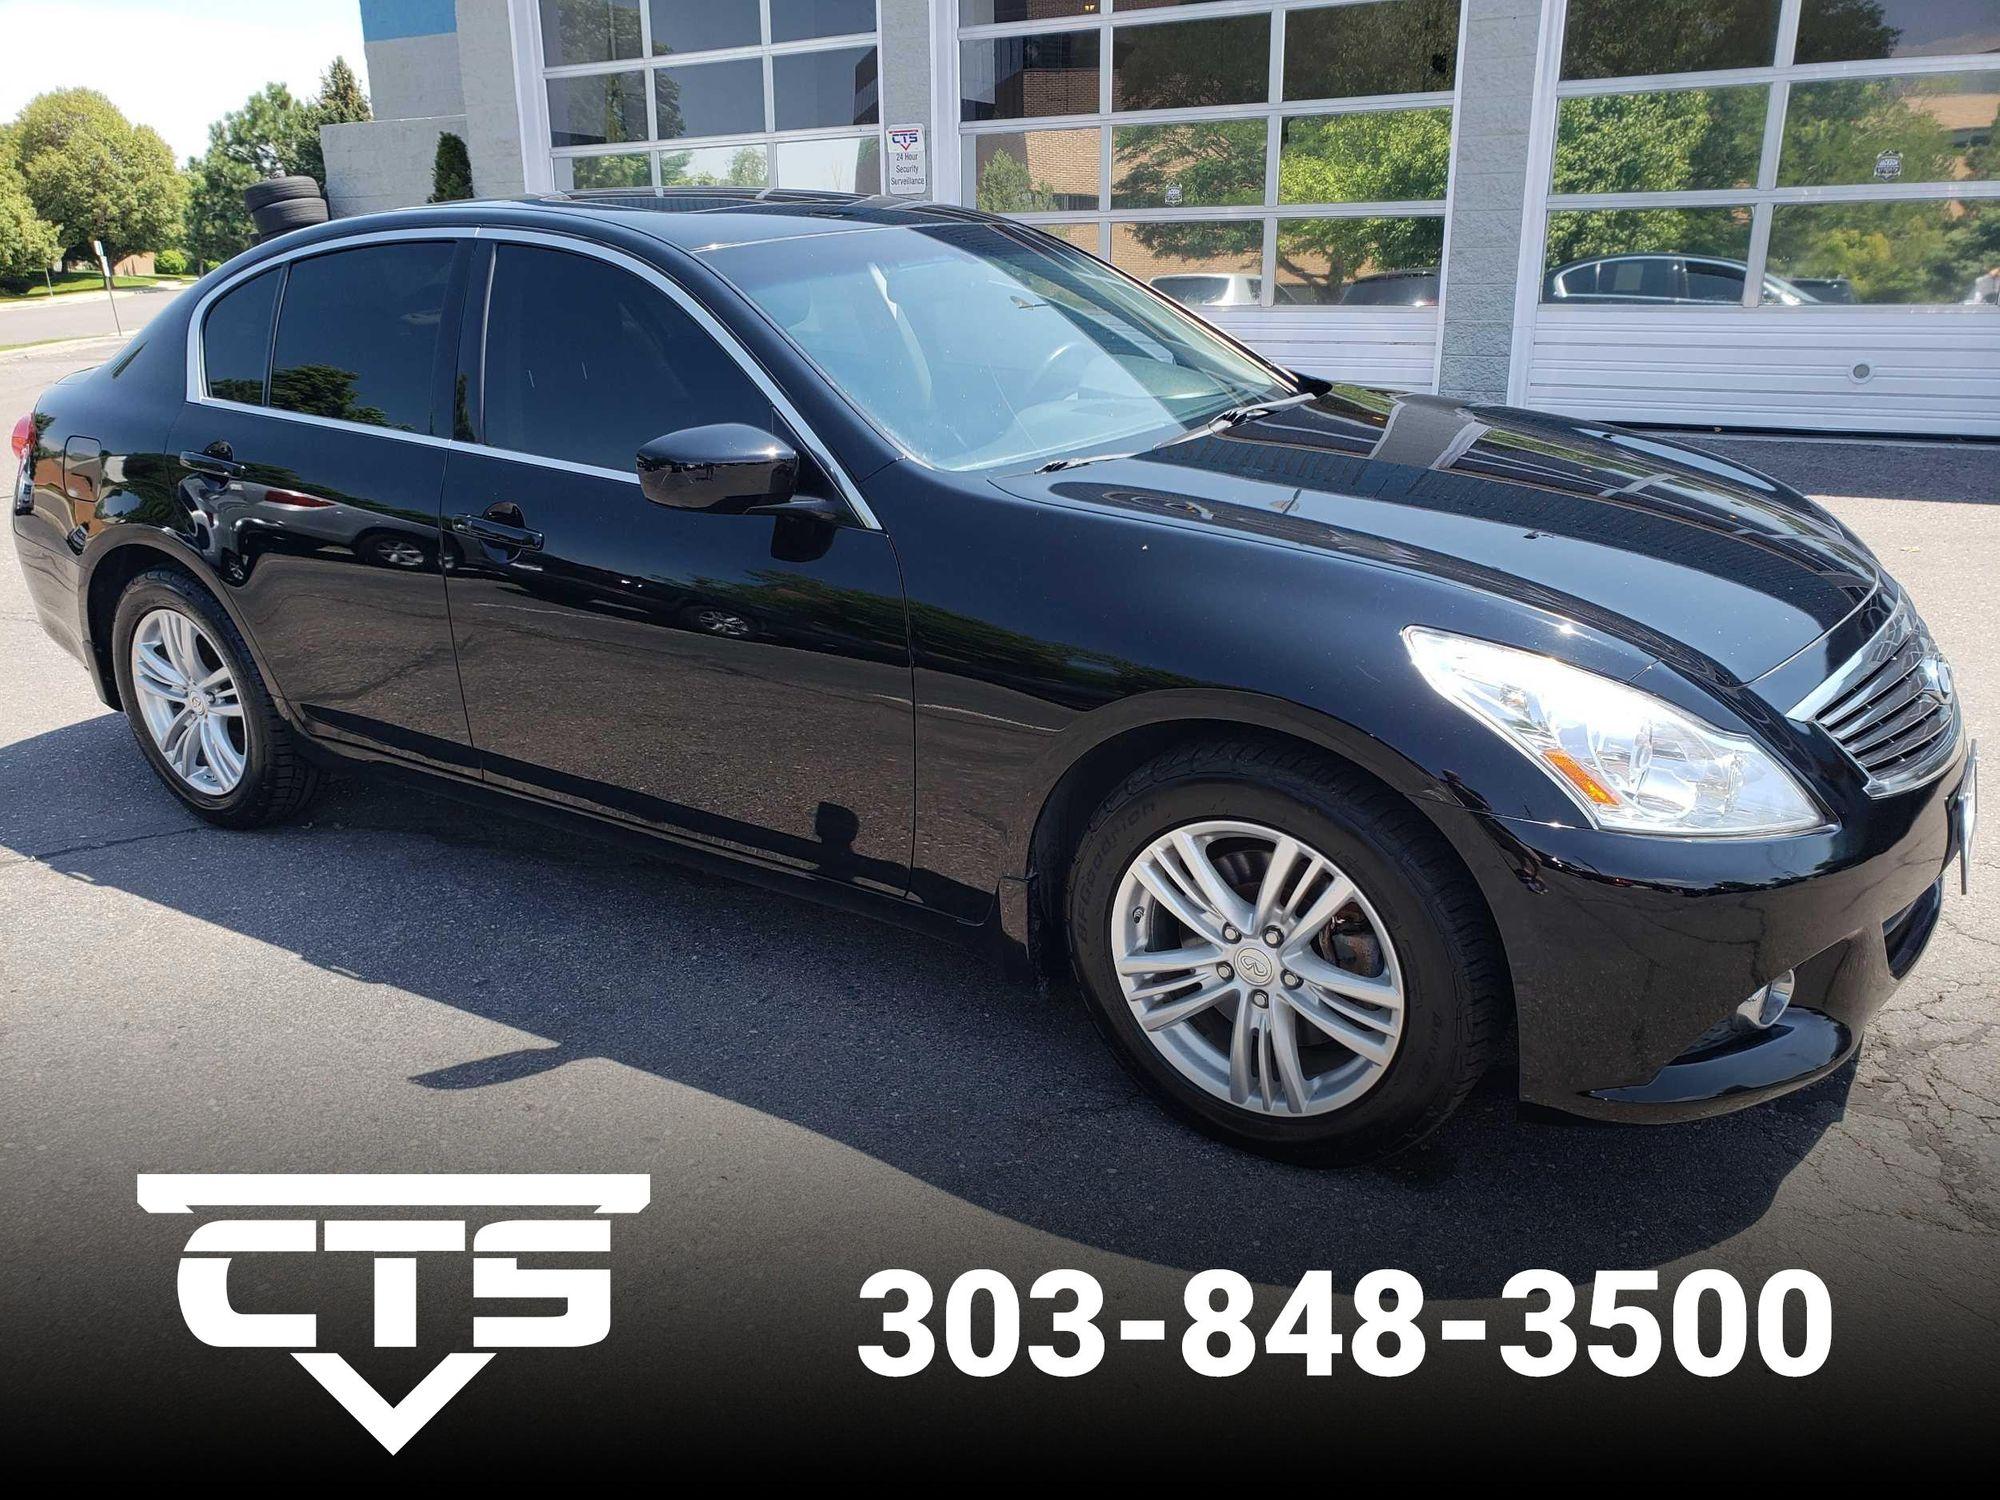 2012 INFINITI G37 Sedan x | CTS Auto Sales